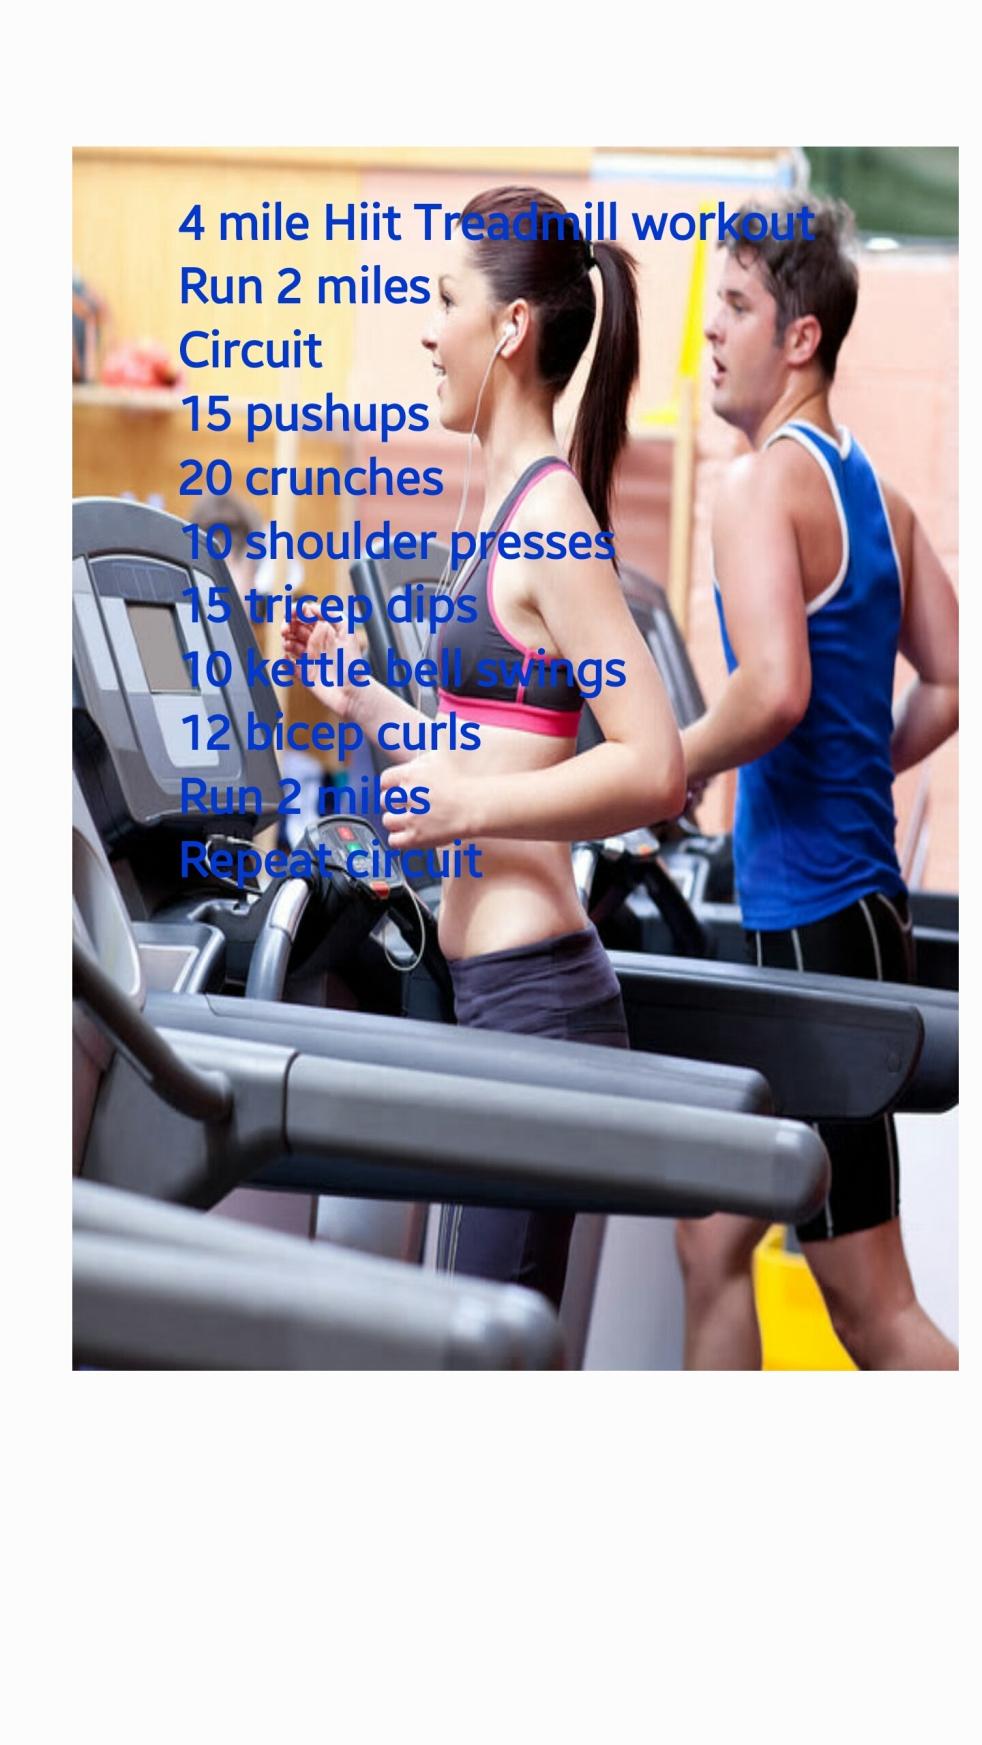 workout_02.jpg